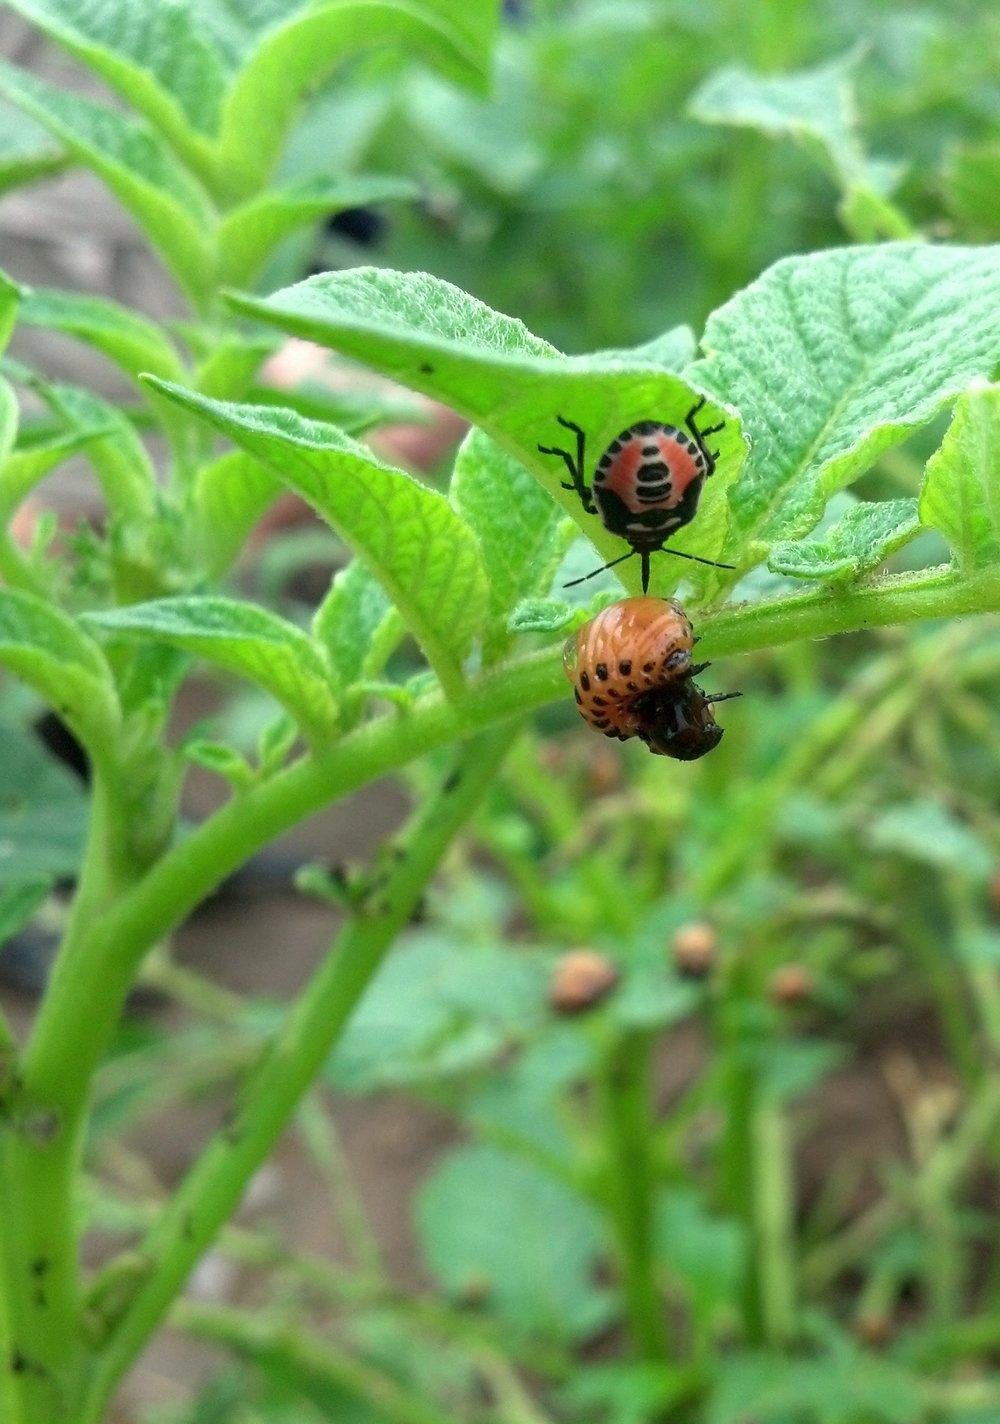 Fifth instar two spotted stink bug (Perillus bioculatus) feeds on a Colorado potato beetle larvae on a potato leaf